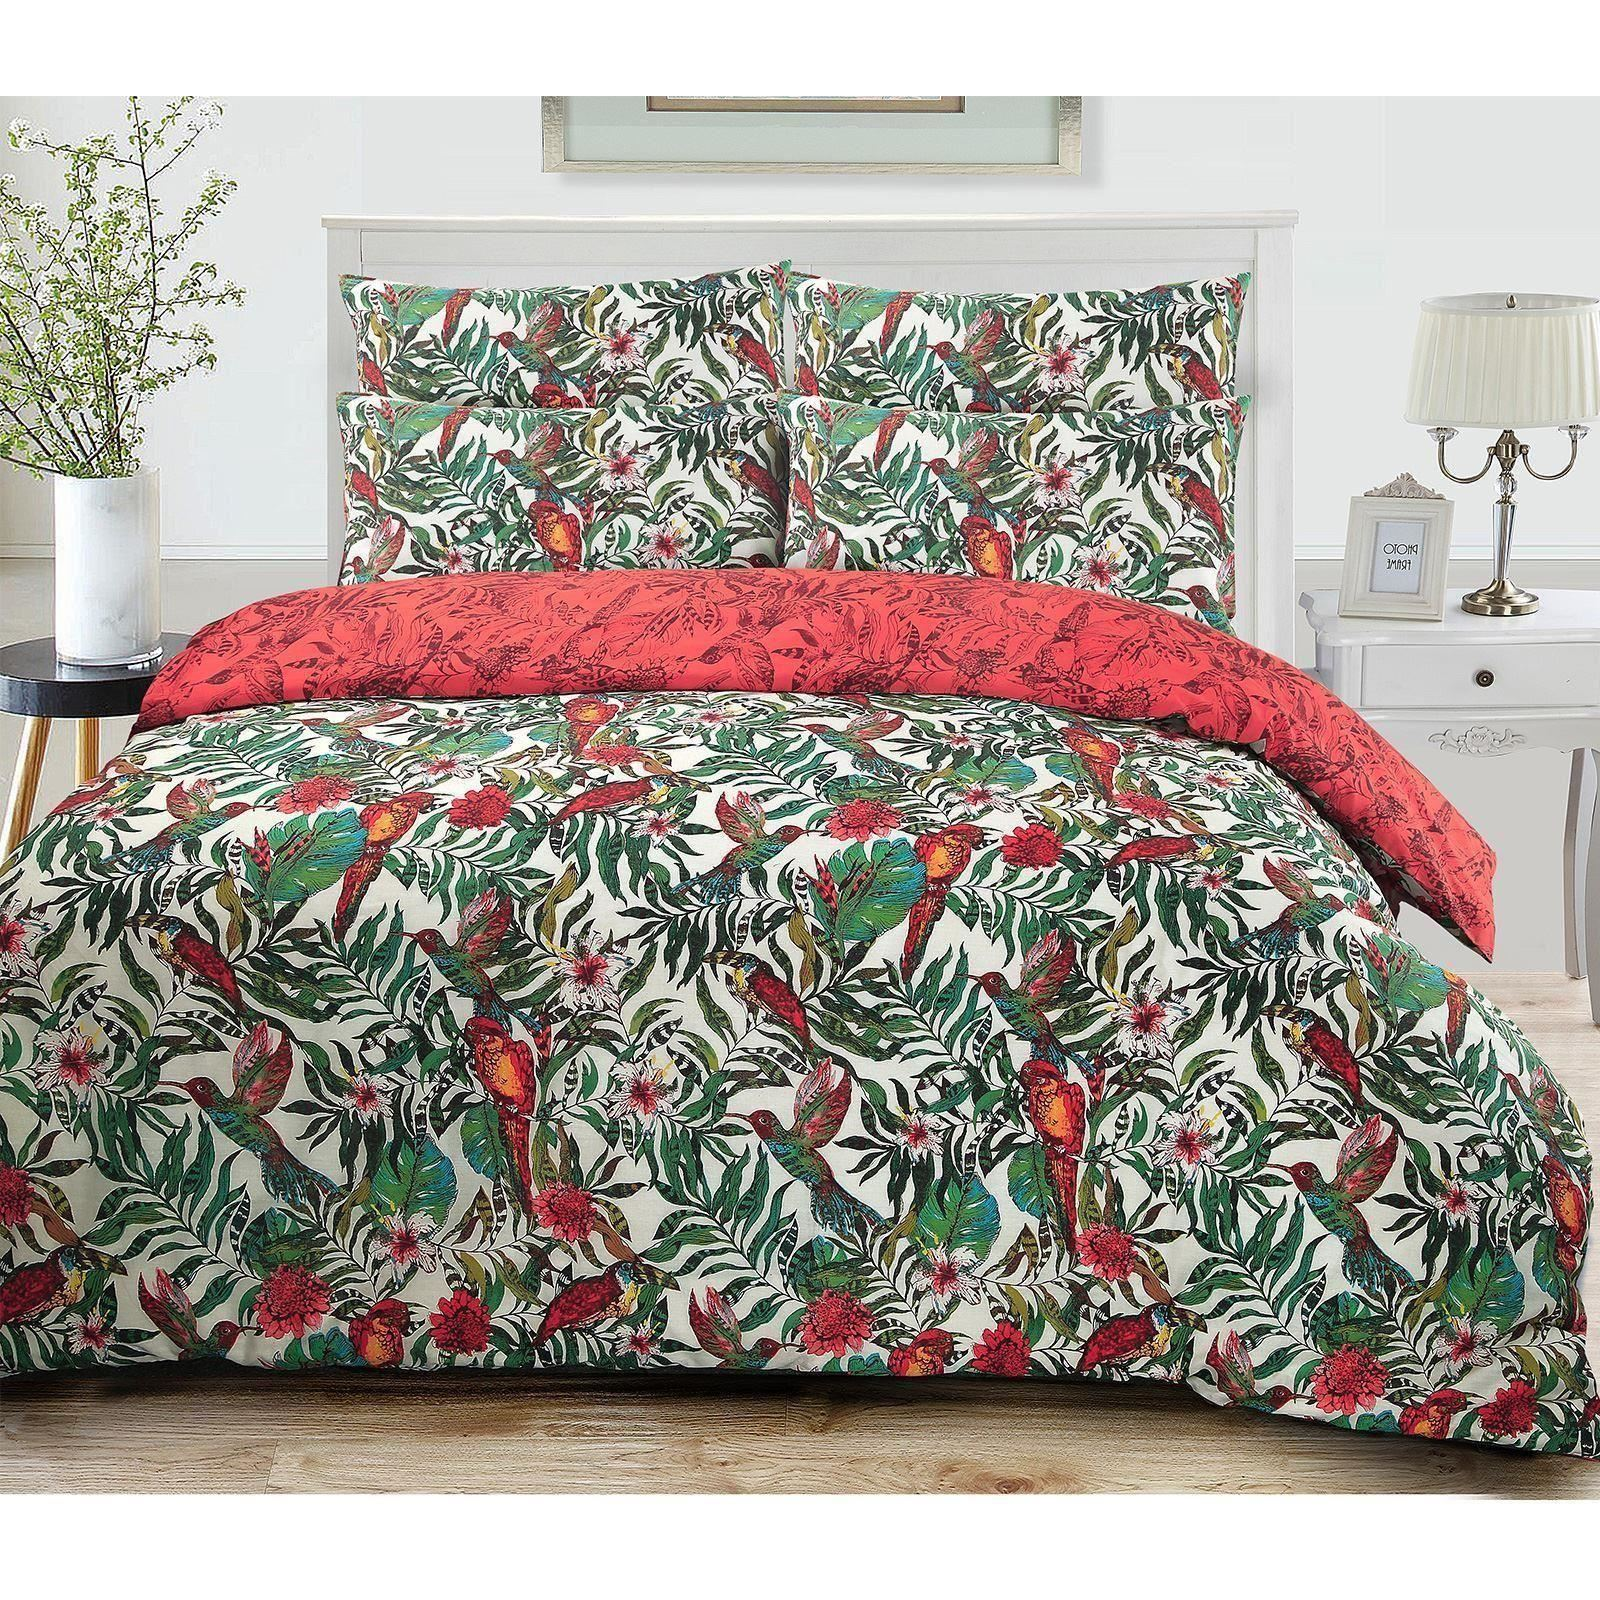 3pc amazon jungle wild birds quilt duvet cover pillowcase bedding